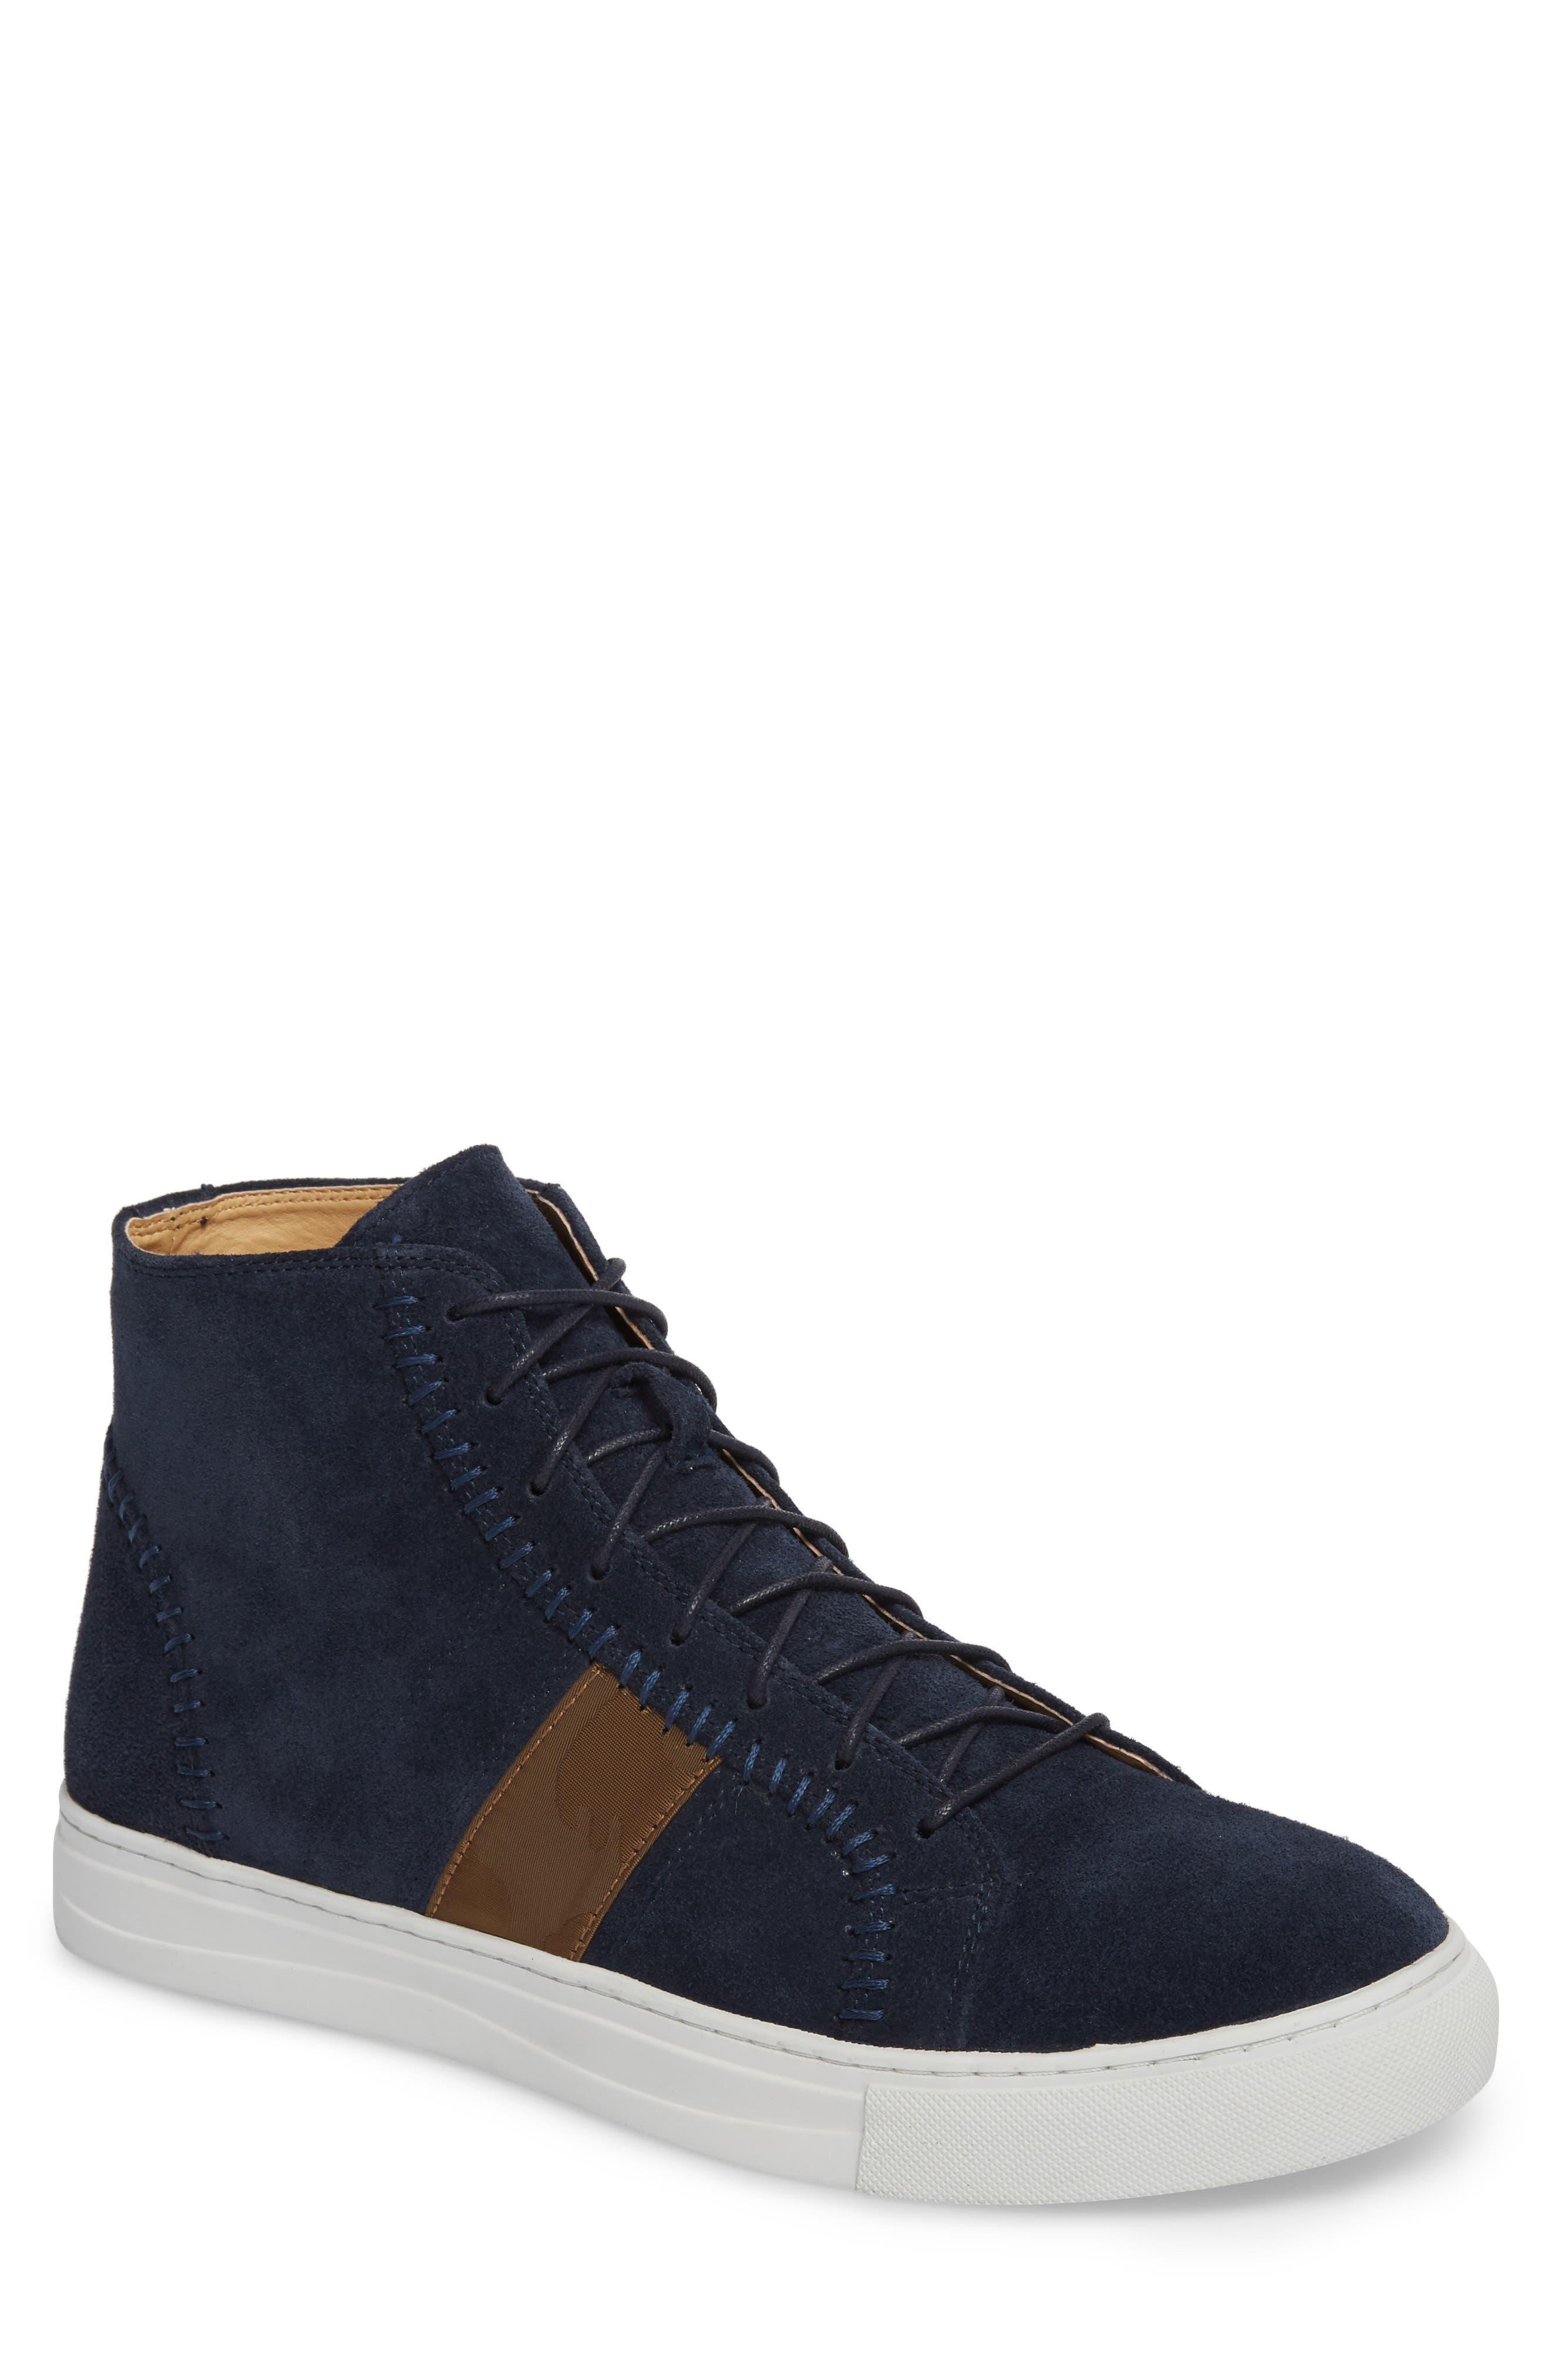 English Laundry High Top Sneaker (Men)